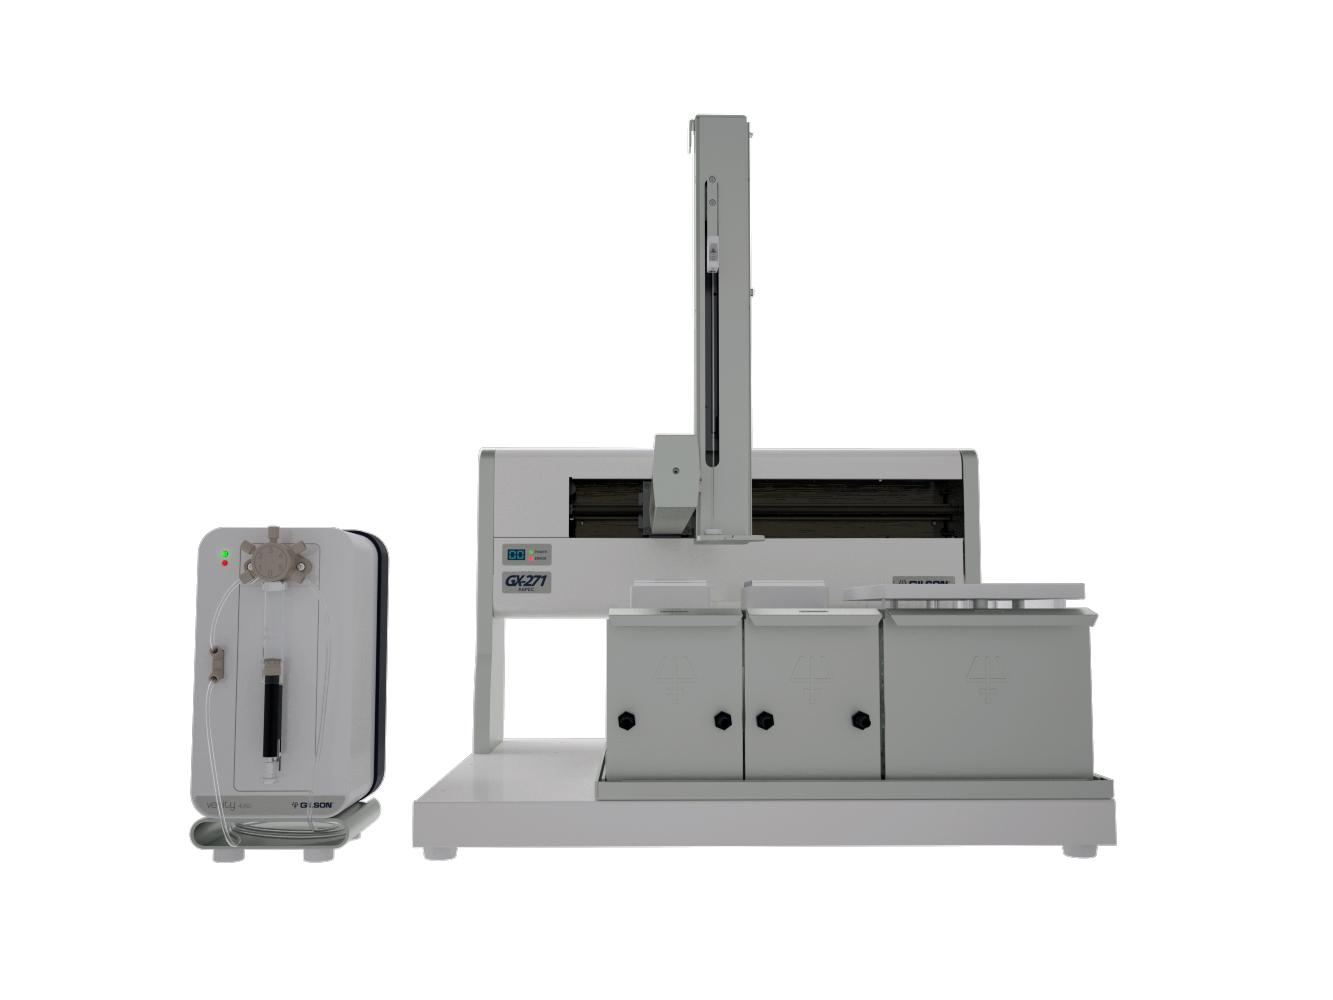 2614007_MAIN_GX-271-ASPEC-with-4060-Single-Syringe-Pump.jpg